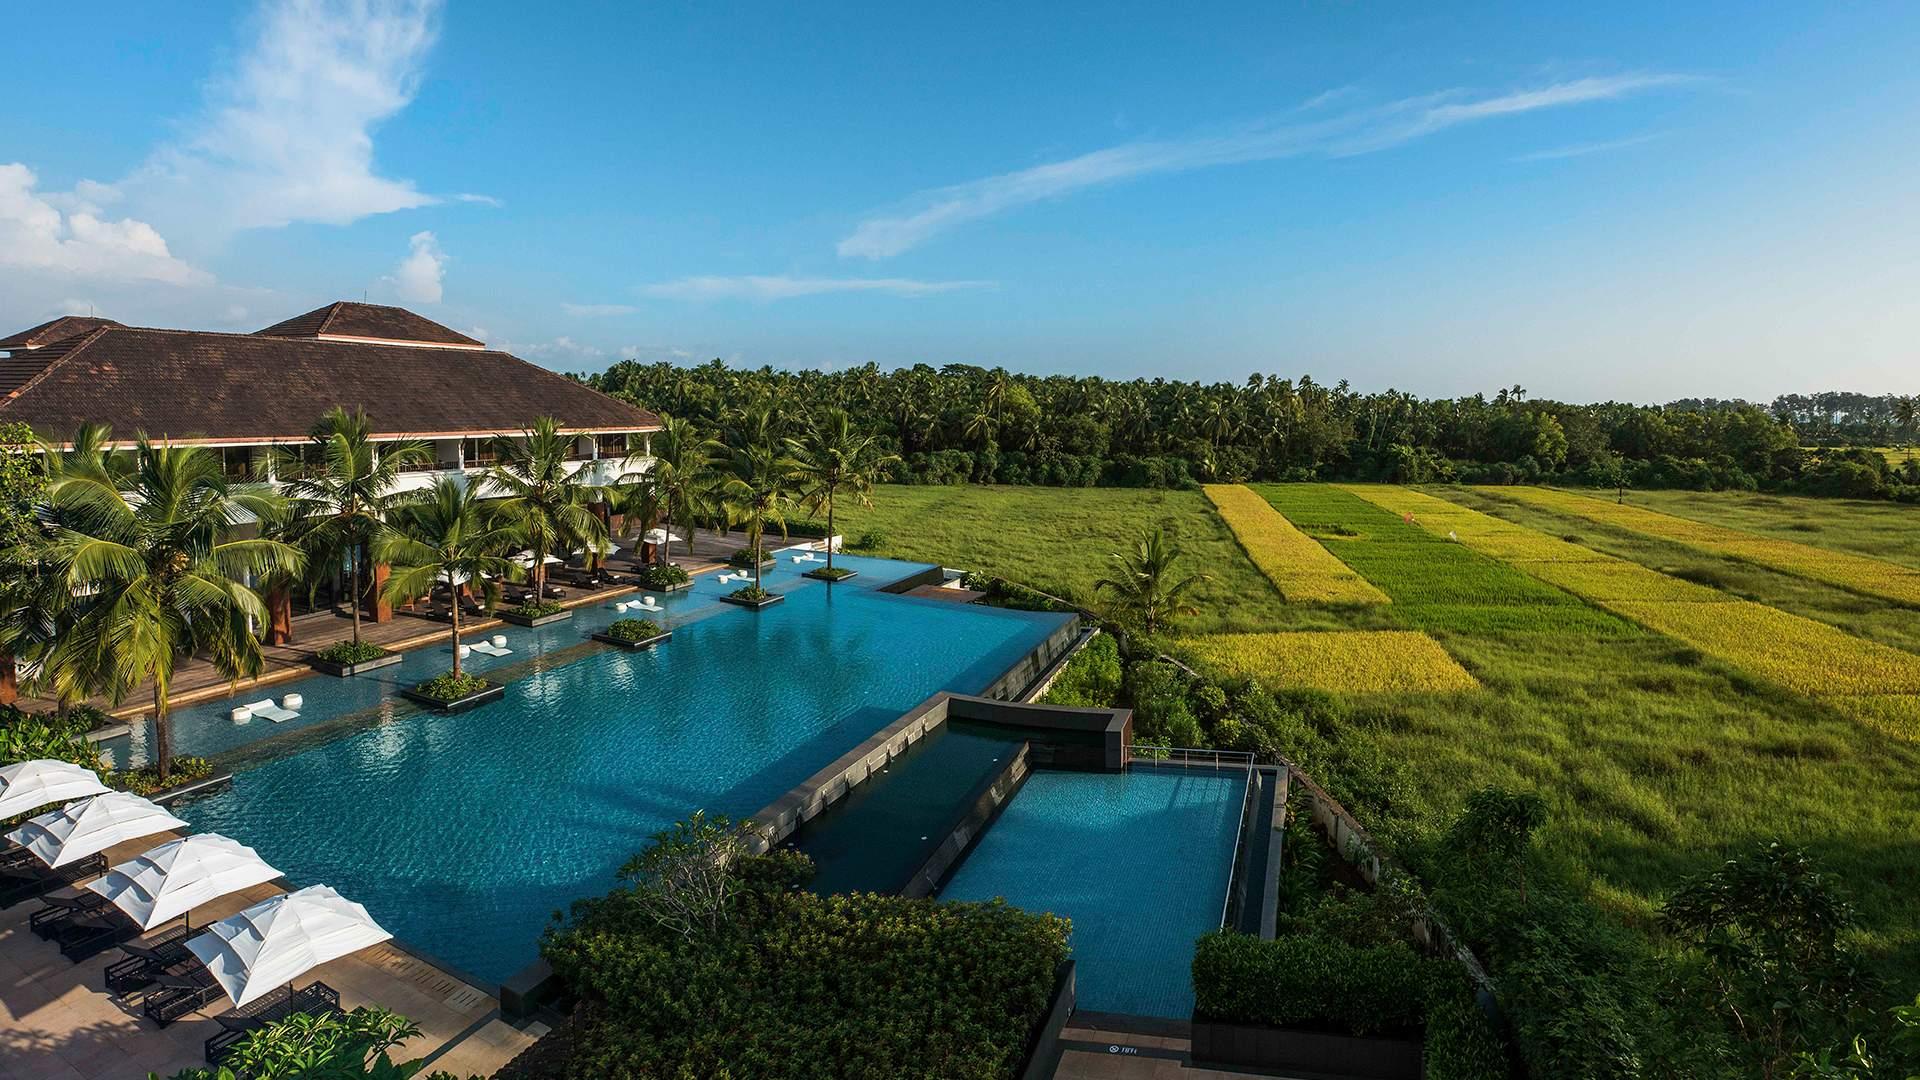 southern goa hotel - Туры в Южное Гоа — родину транс музыки с lotus-goa